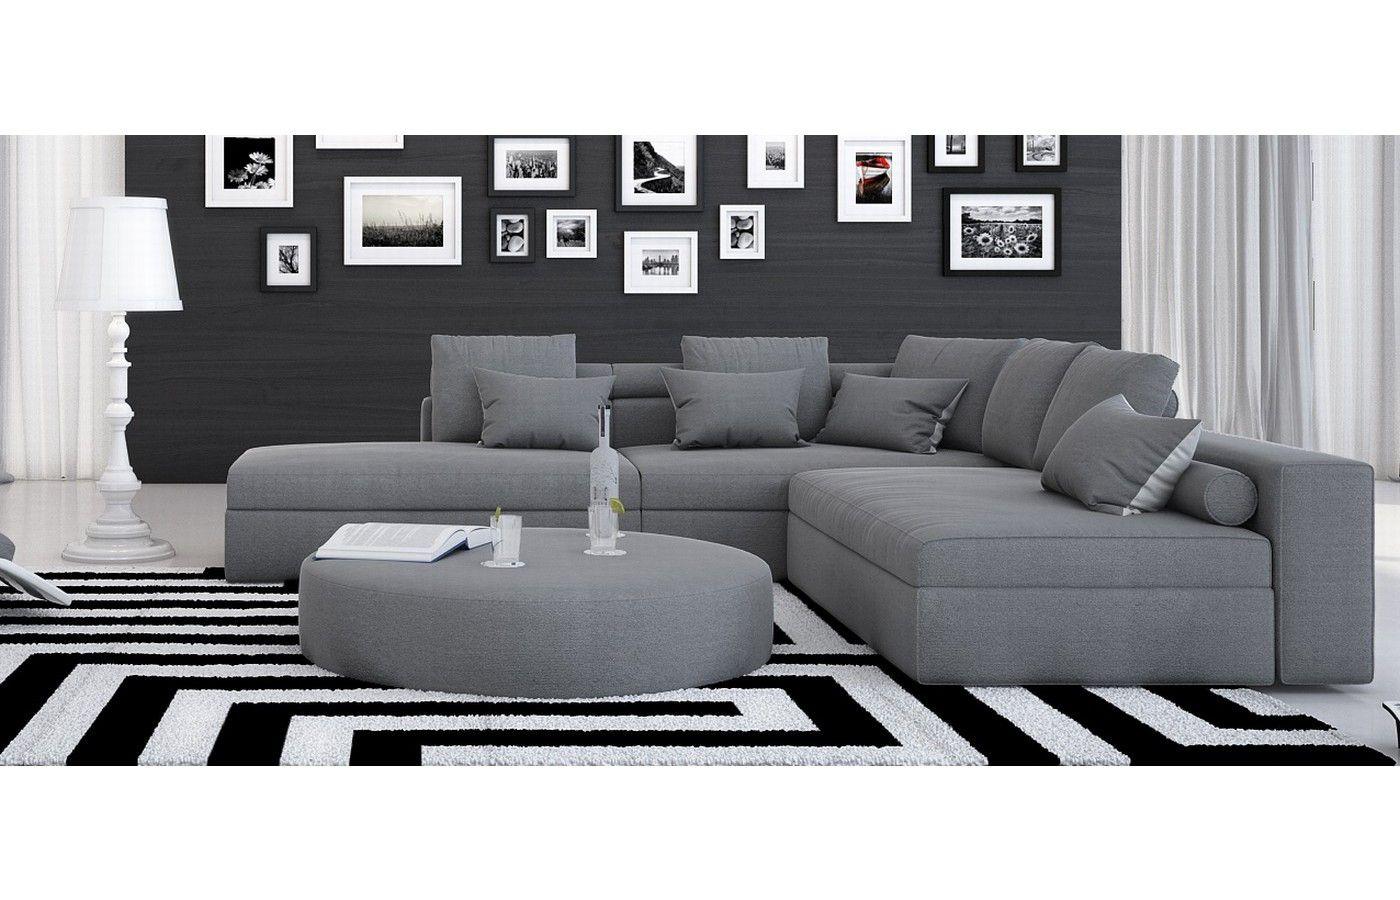 stoffsofa ari ecksofa in grau at home sofa stoff. Black Bedroom Furniture Sets. Home Design Ideas